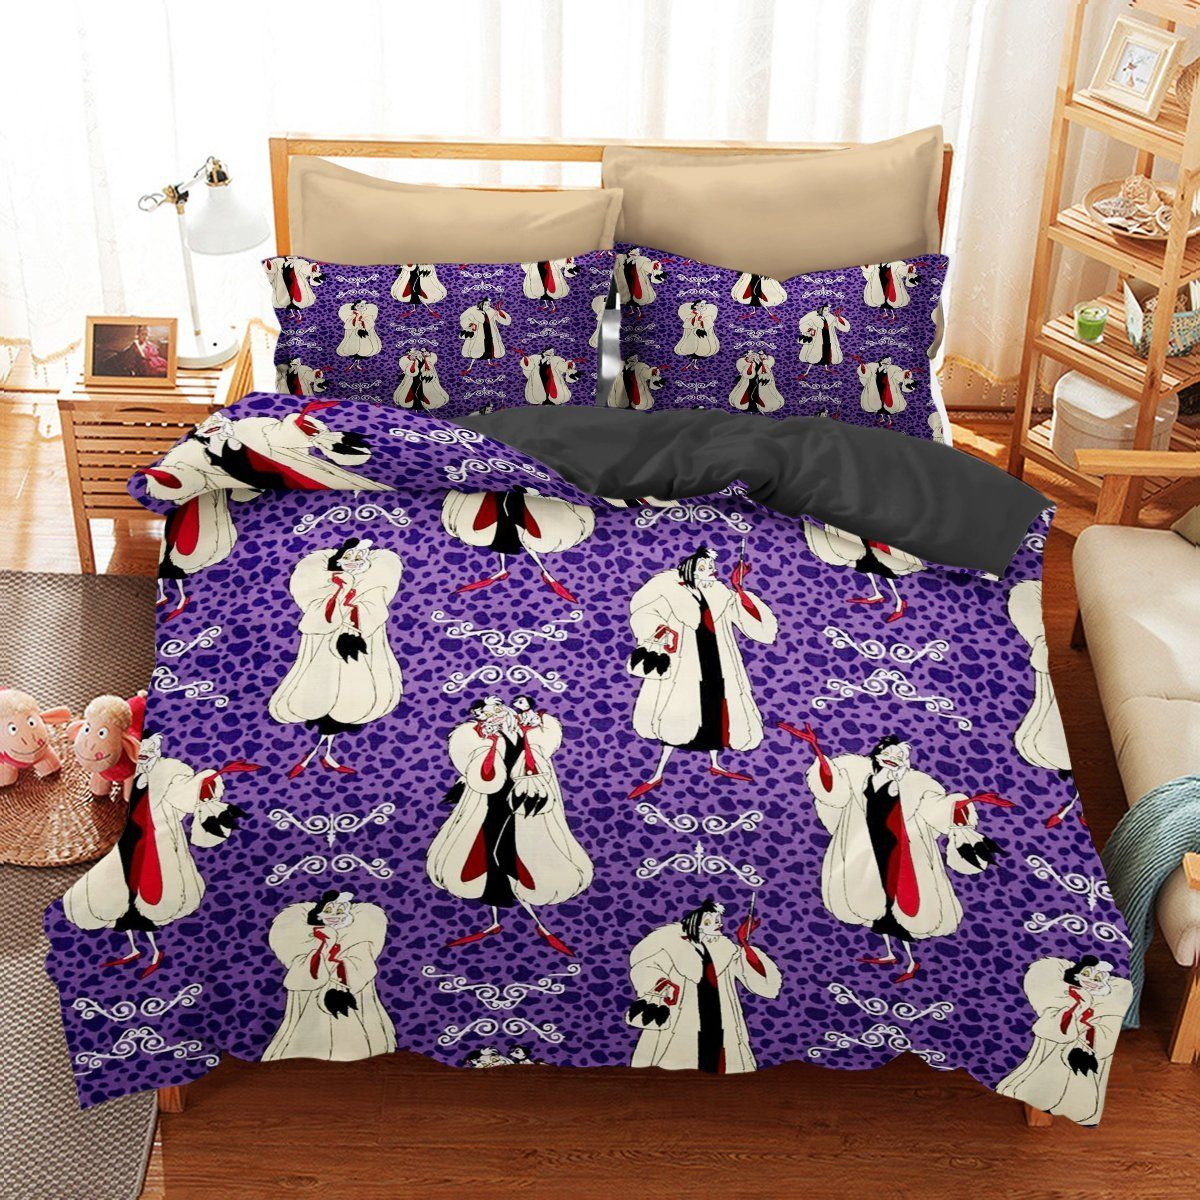 Bedding set disney villains funny gift idea